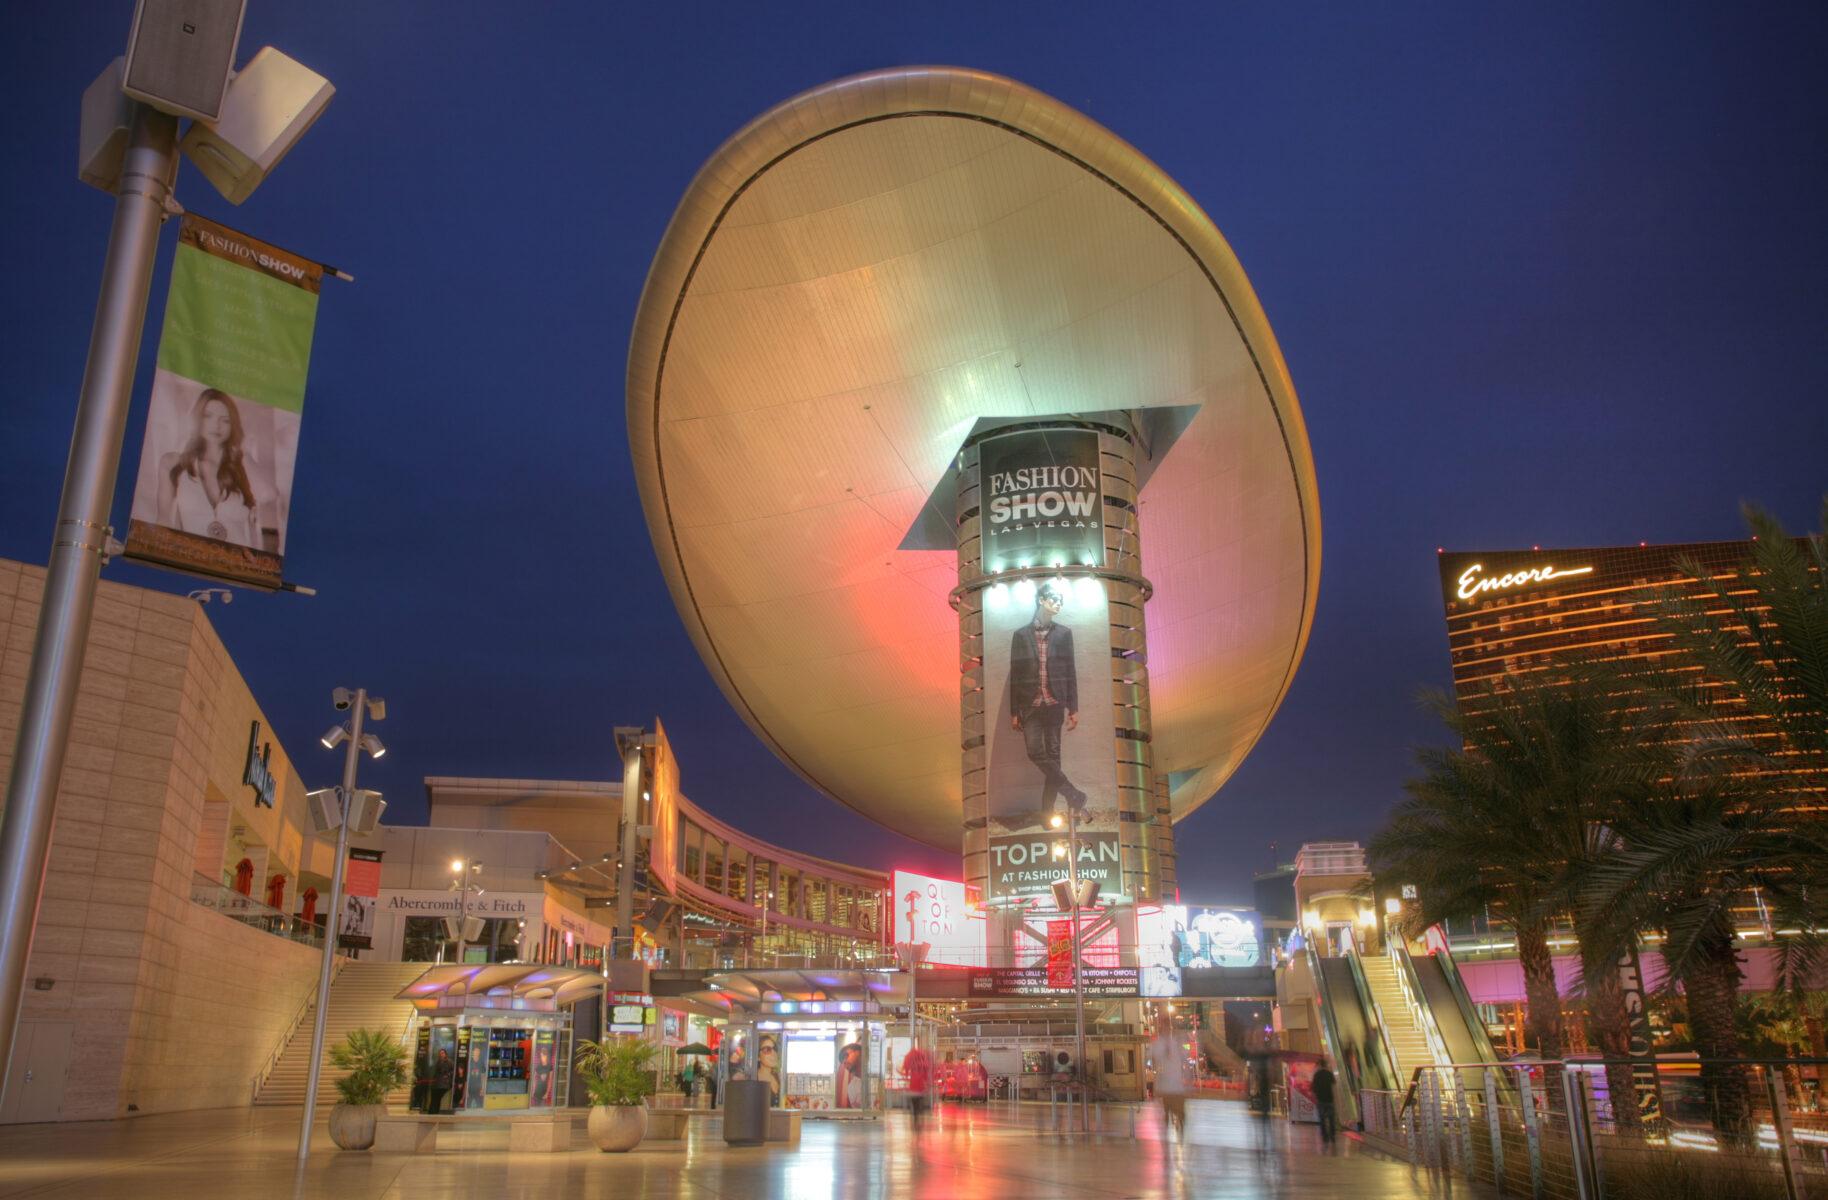 Fashion Show Mall in Las Vegas Nevada